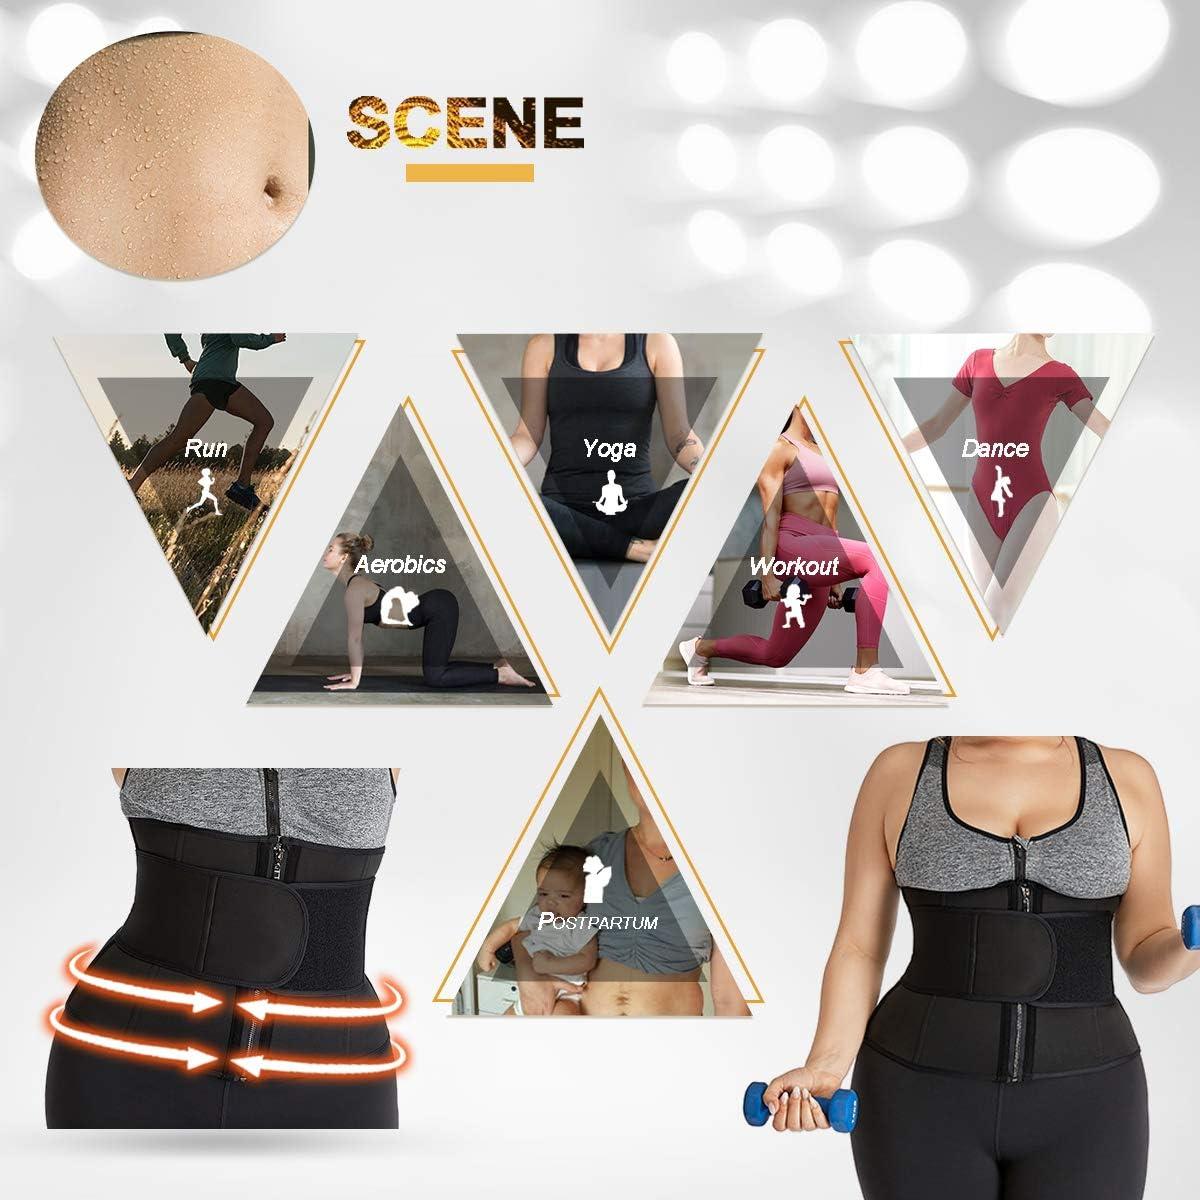 lttcbro Waist Trainer Belt Plus Size Tummy Slimming Sport Girdle Belt for Weight Loss Sauna Waist Cincher